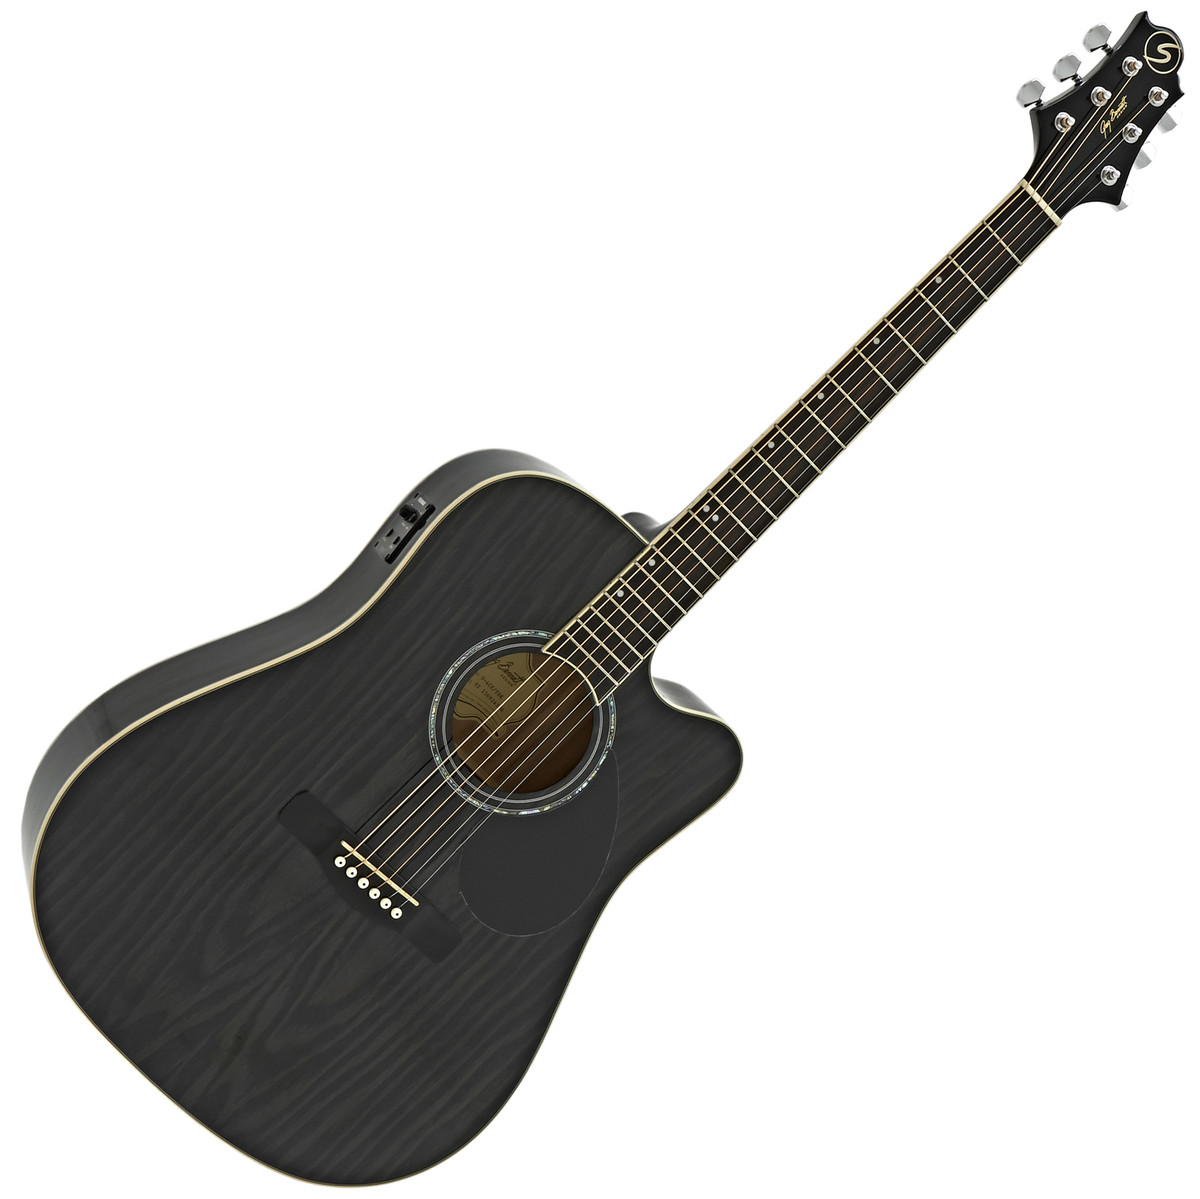 Image of Greg Bennett D-4CE Electro Acoustic Guitar Trans Black